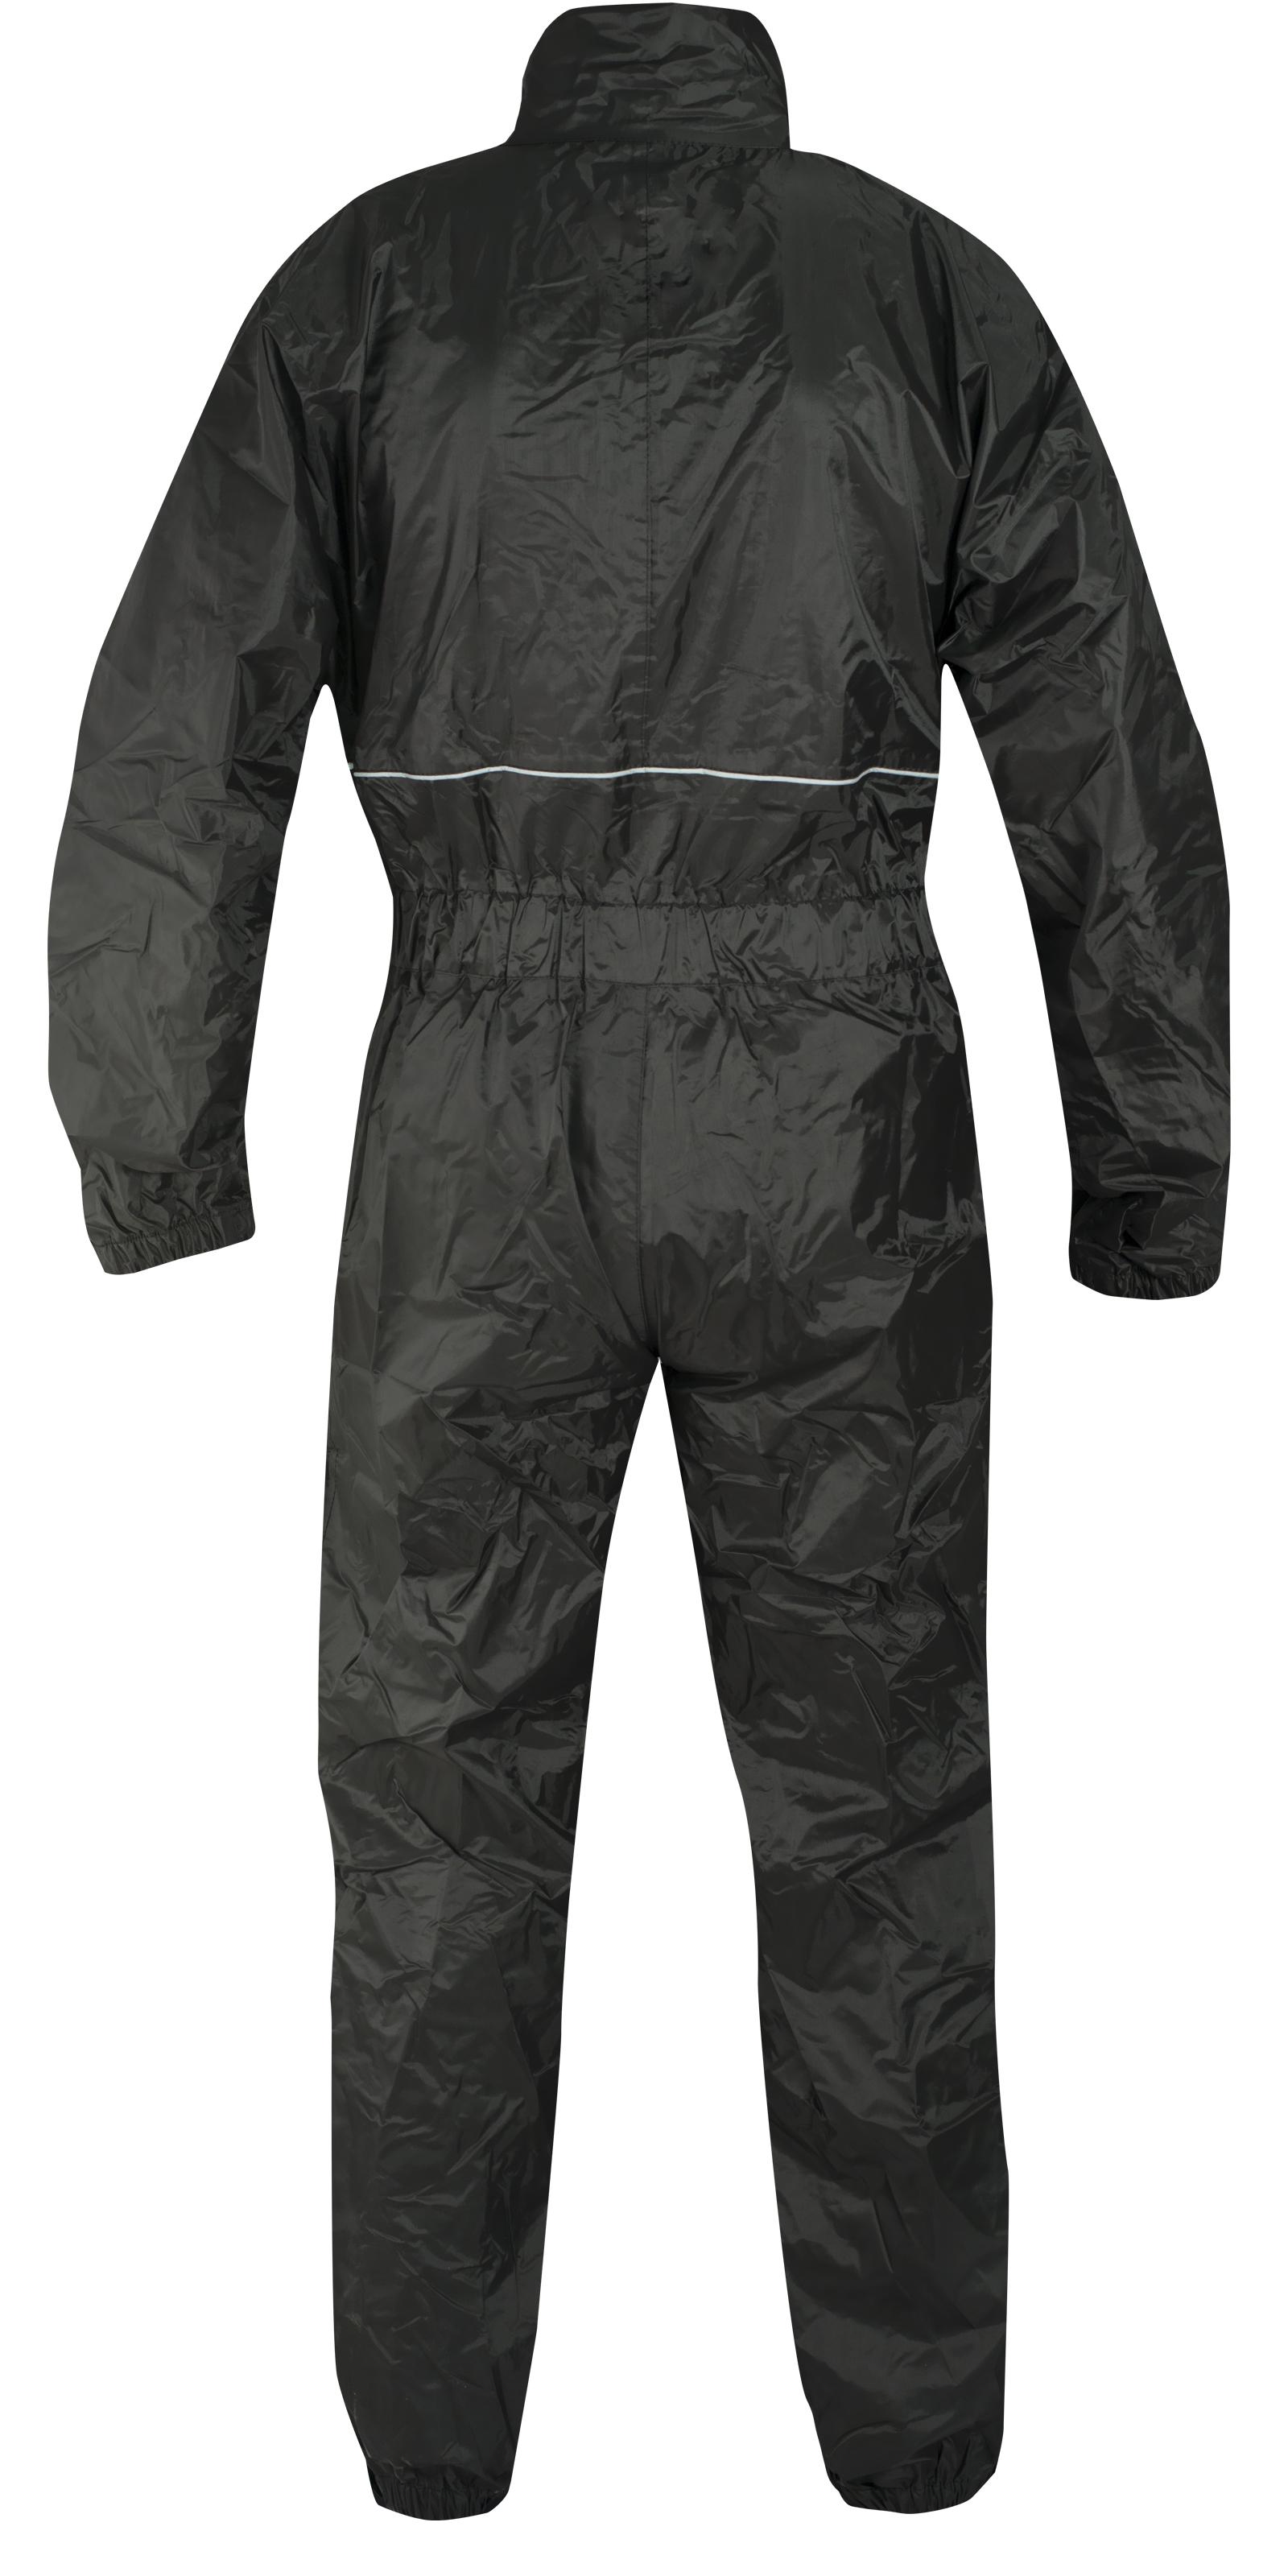 combinaison anti pluie 100 tanche moto scooter custom 1 pi ce nylon ebay. Black Bedroom Furniture Sets. Home Design Ideas